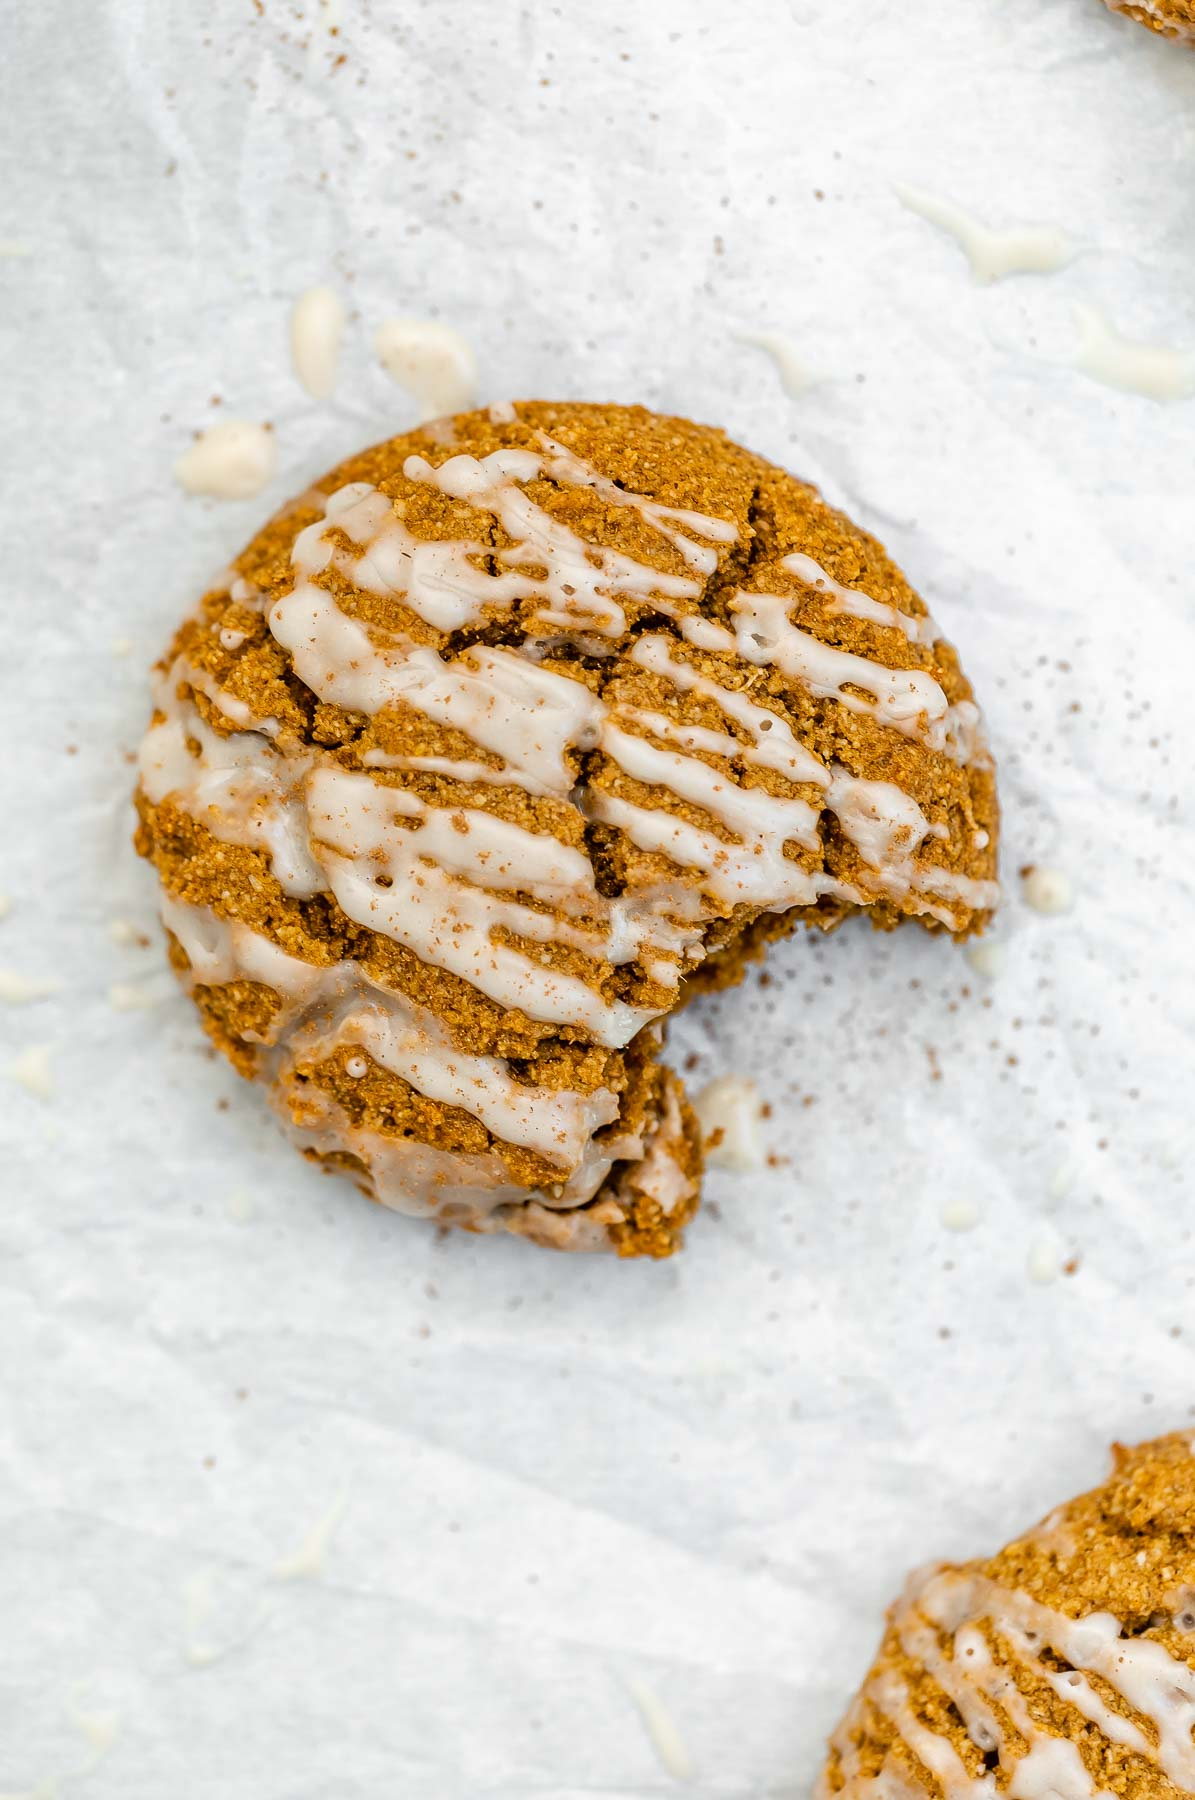 Overhead shot of one pumpkin cookie with cinnamon on top.